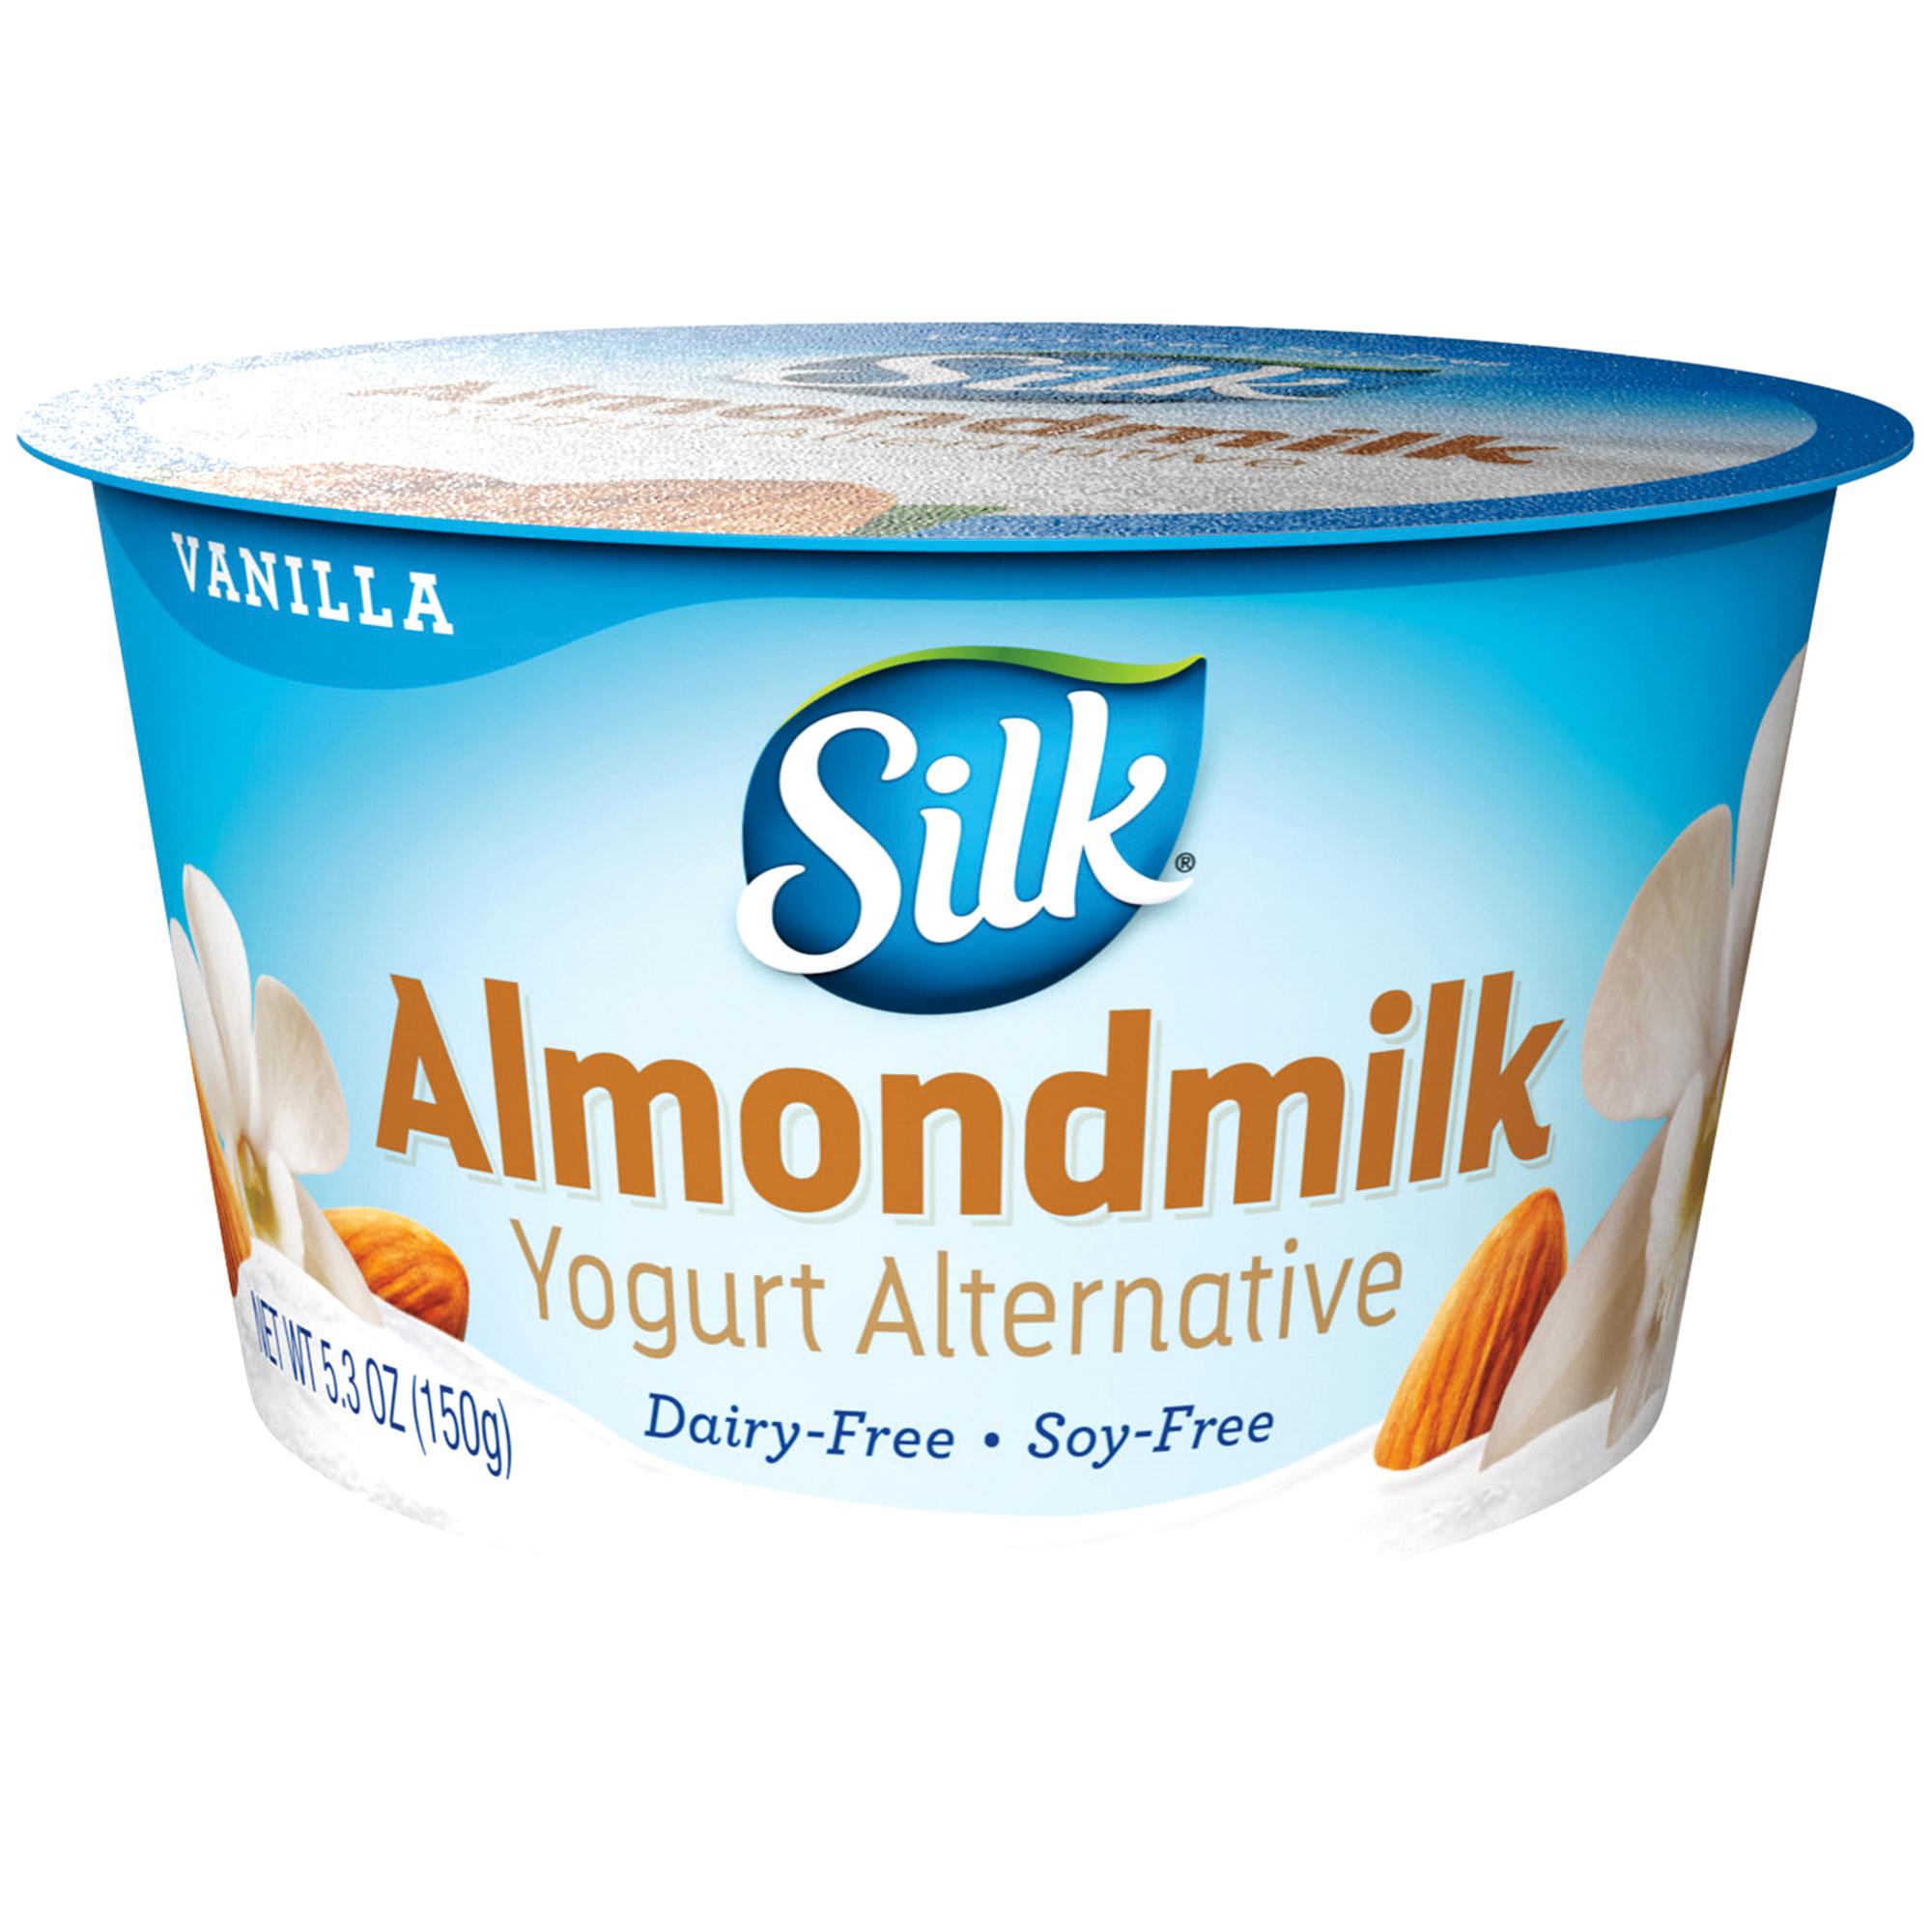 Silk® Vanilla Almond Dairy-Free Yogurt Alternative 5.3 oz | Meijer.com